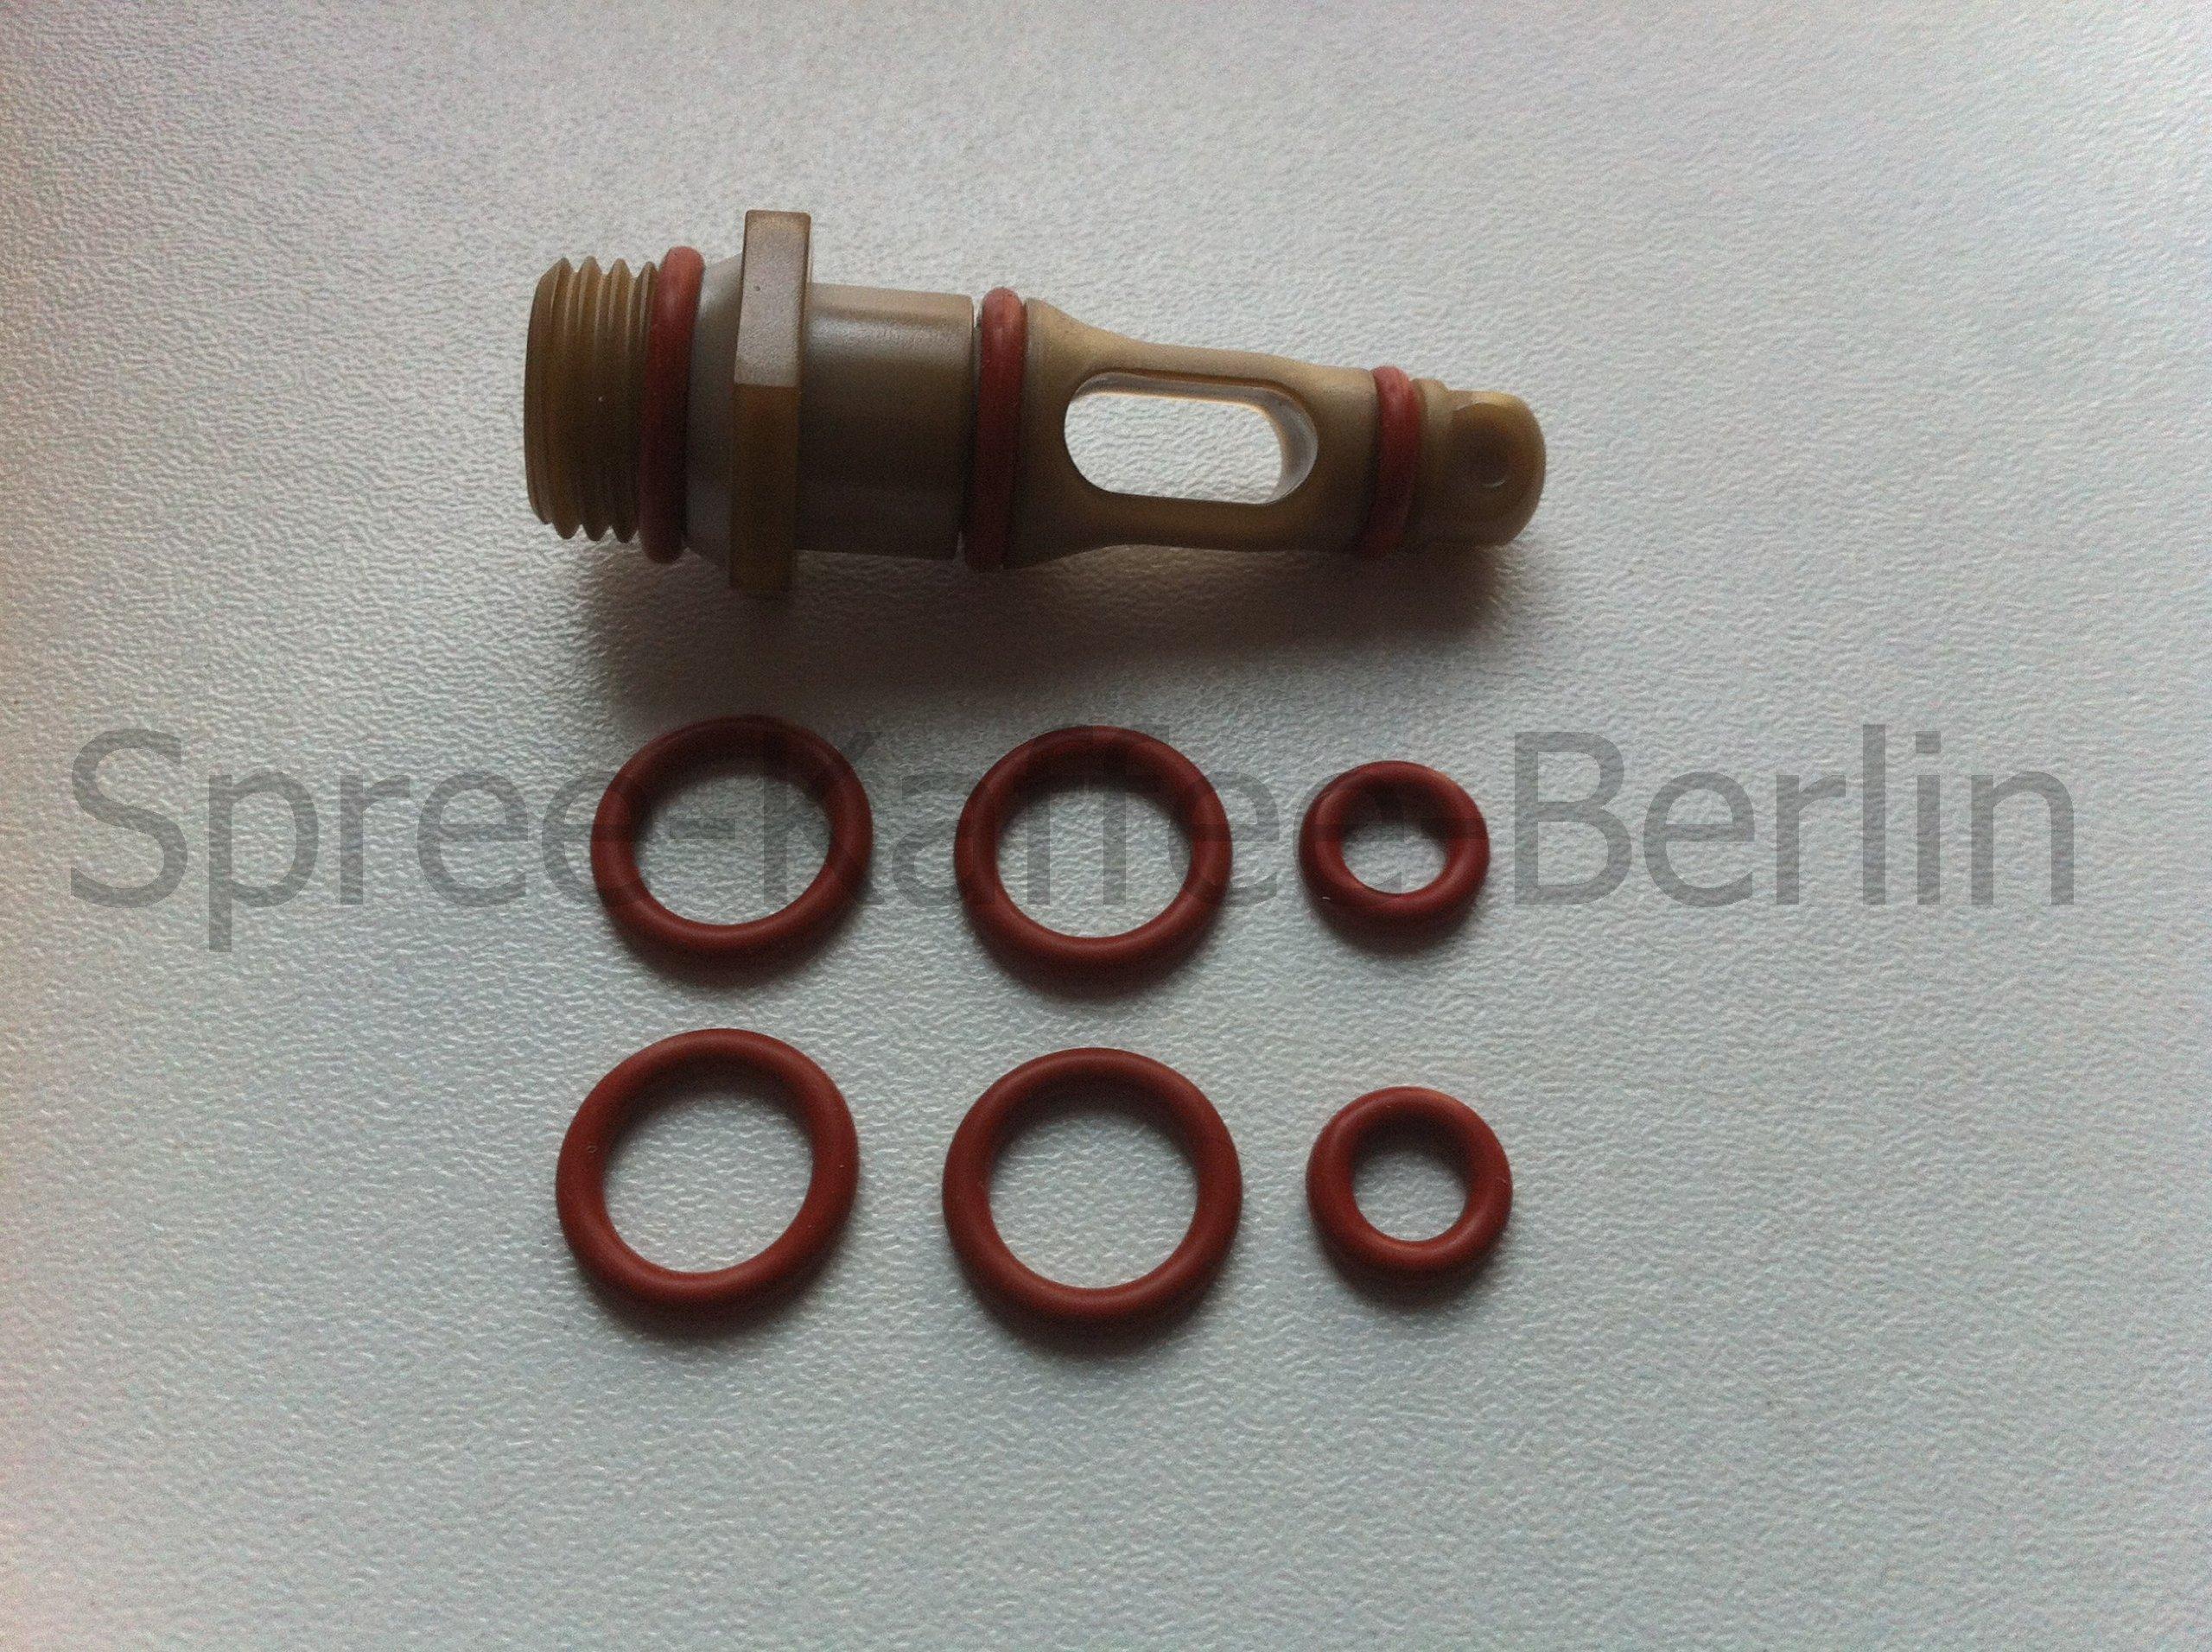 SKB-Dichtungs-Set-AuslaufventilSupportventil-geeignet-fr-Saeco-Spidem-Kaffeevollautomaten-Set-56